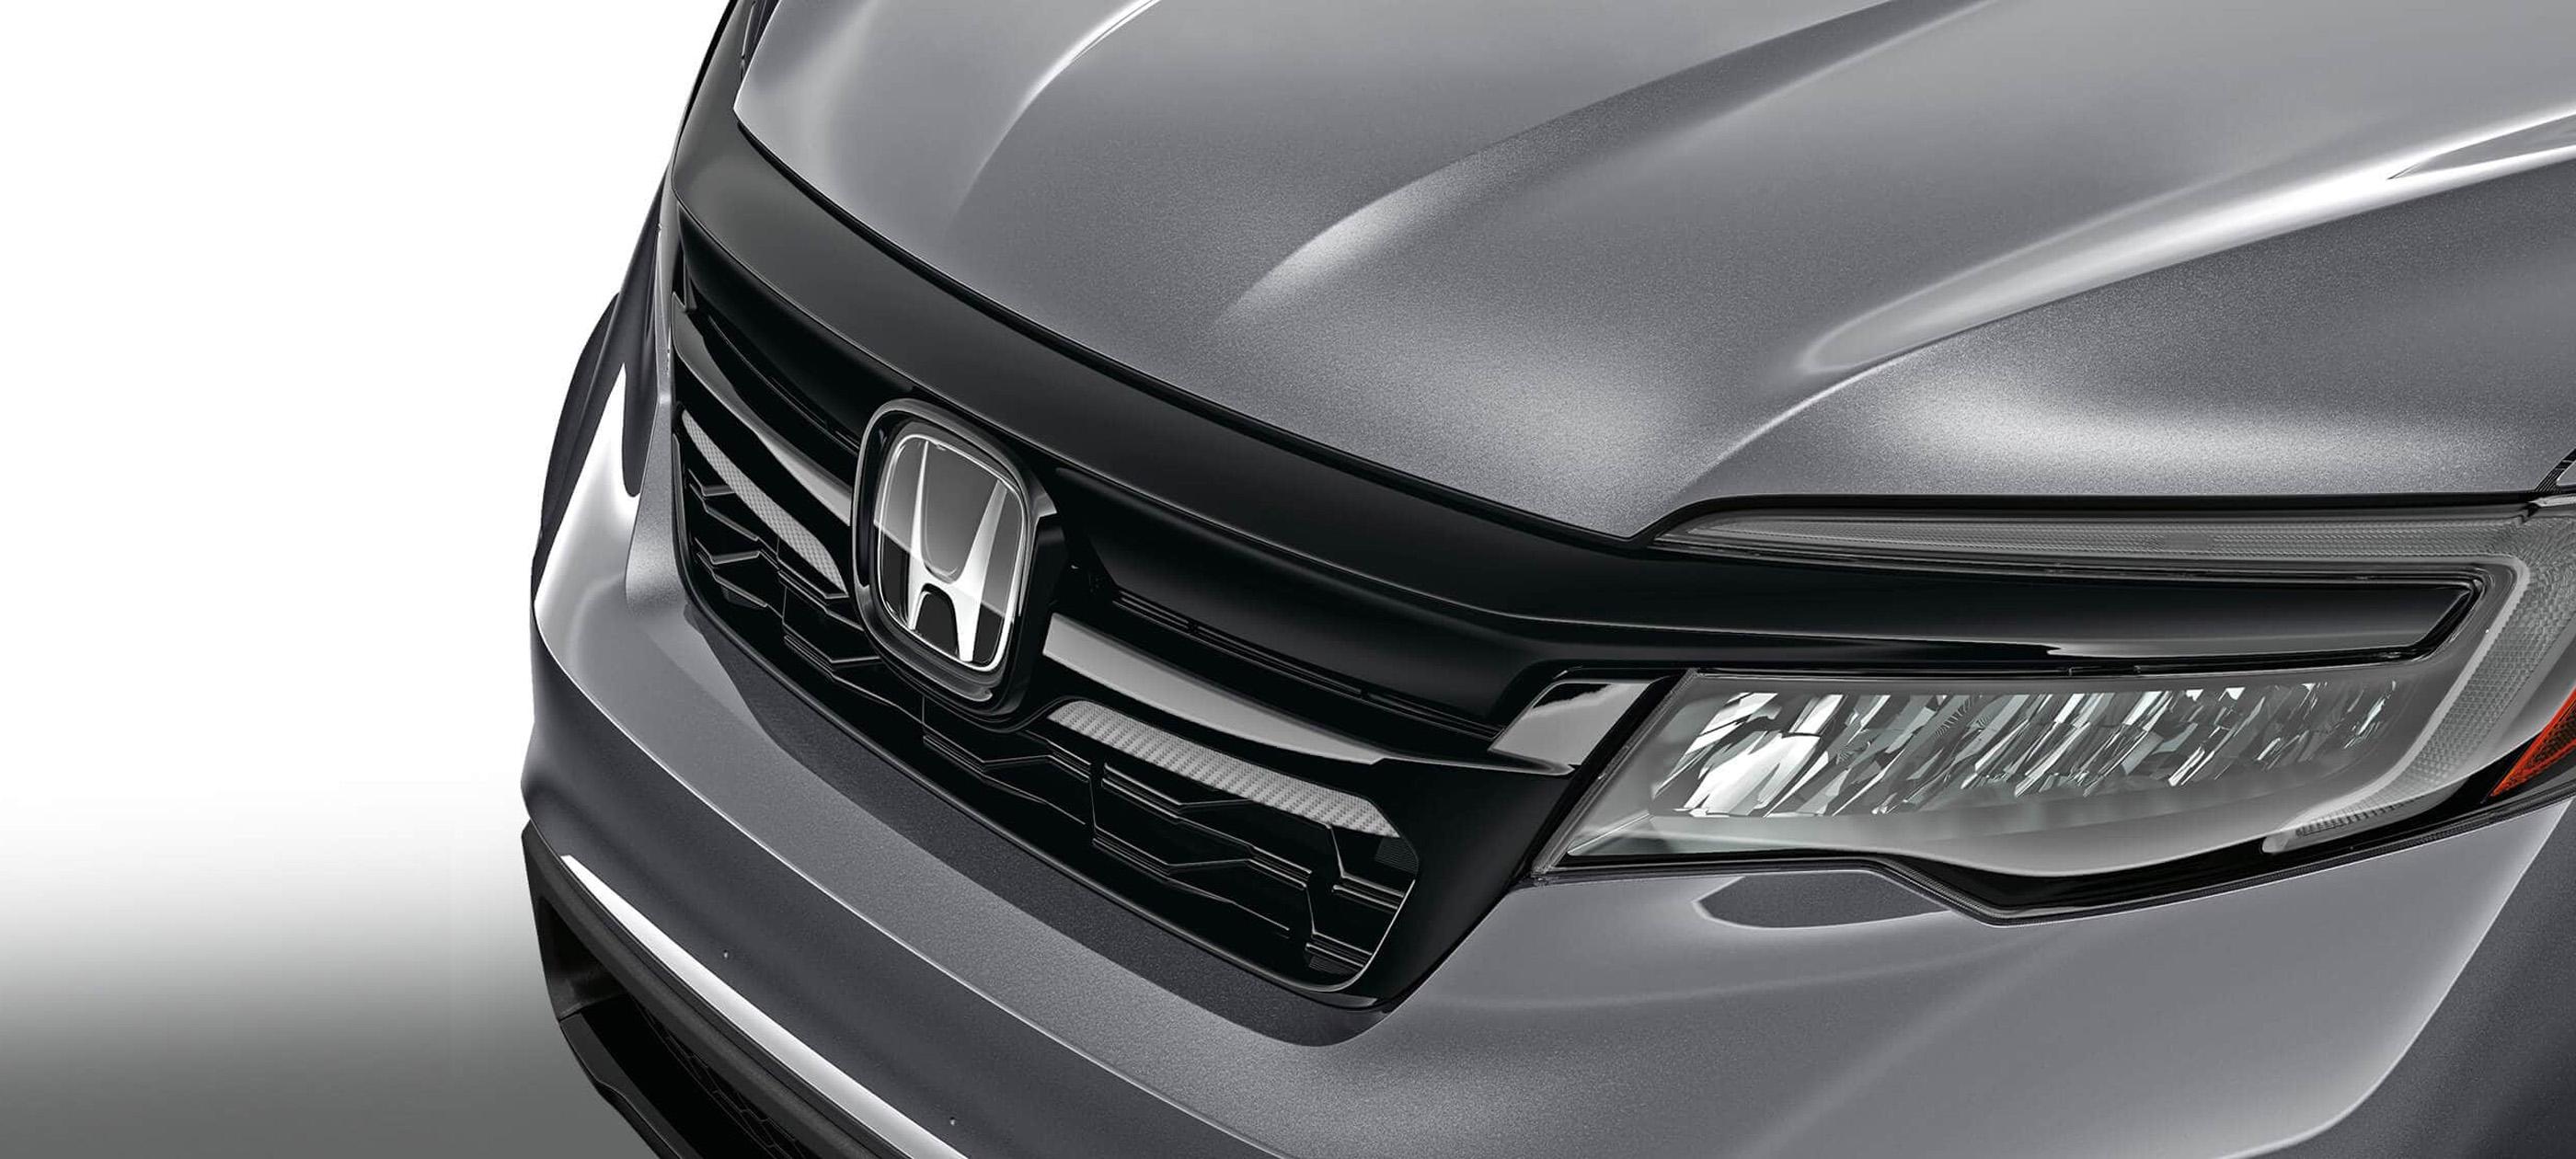 2019 Honda Pilot | Paragon Honda | Modern Family SUV